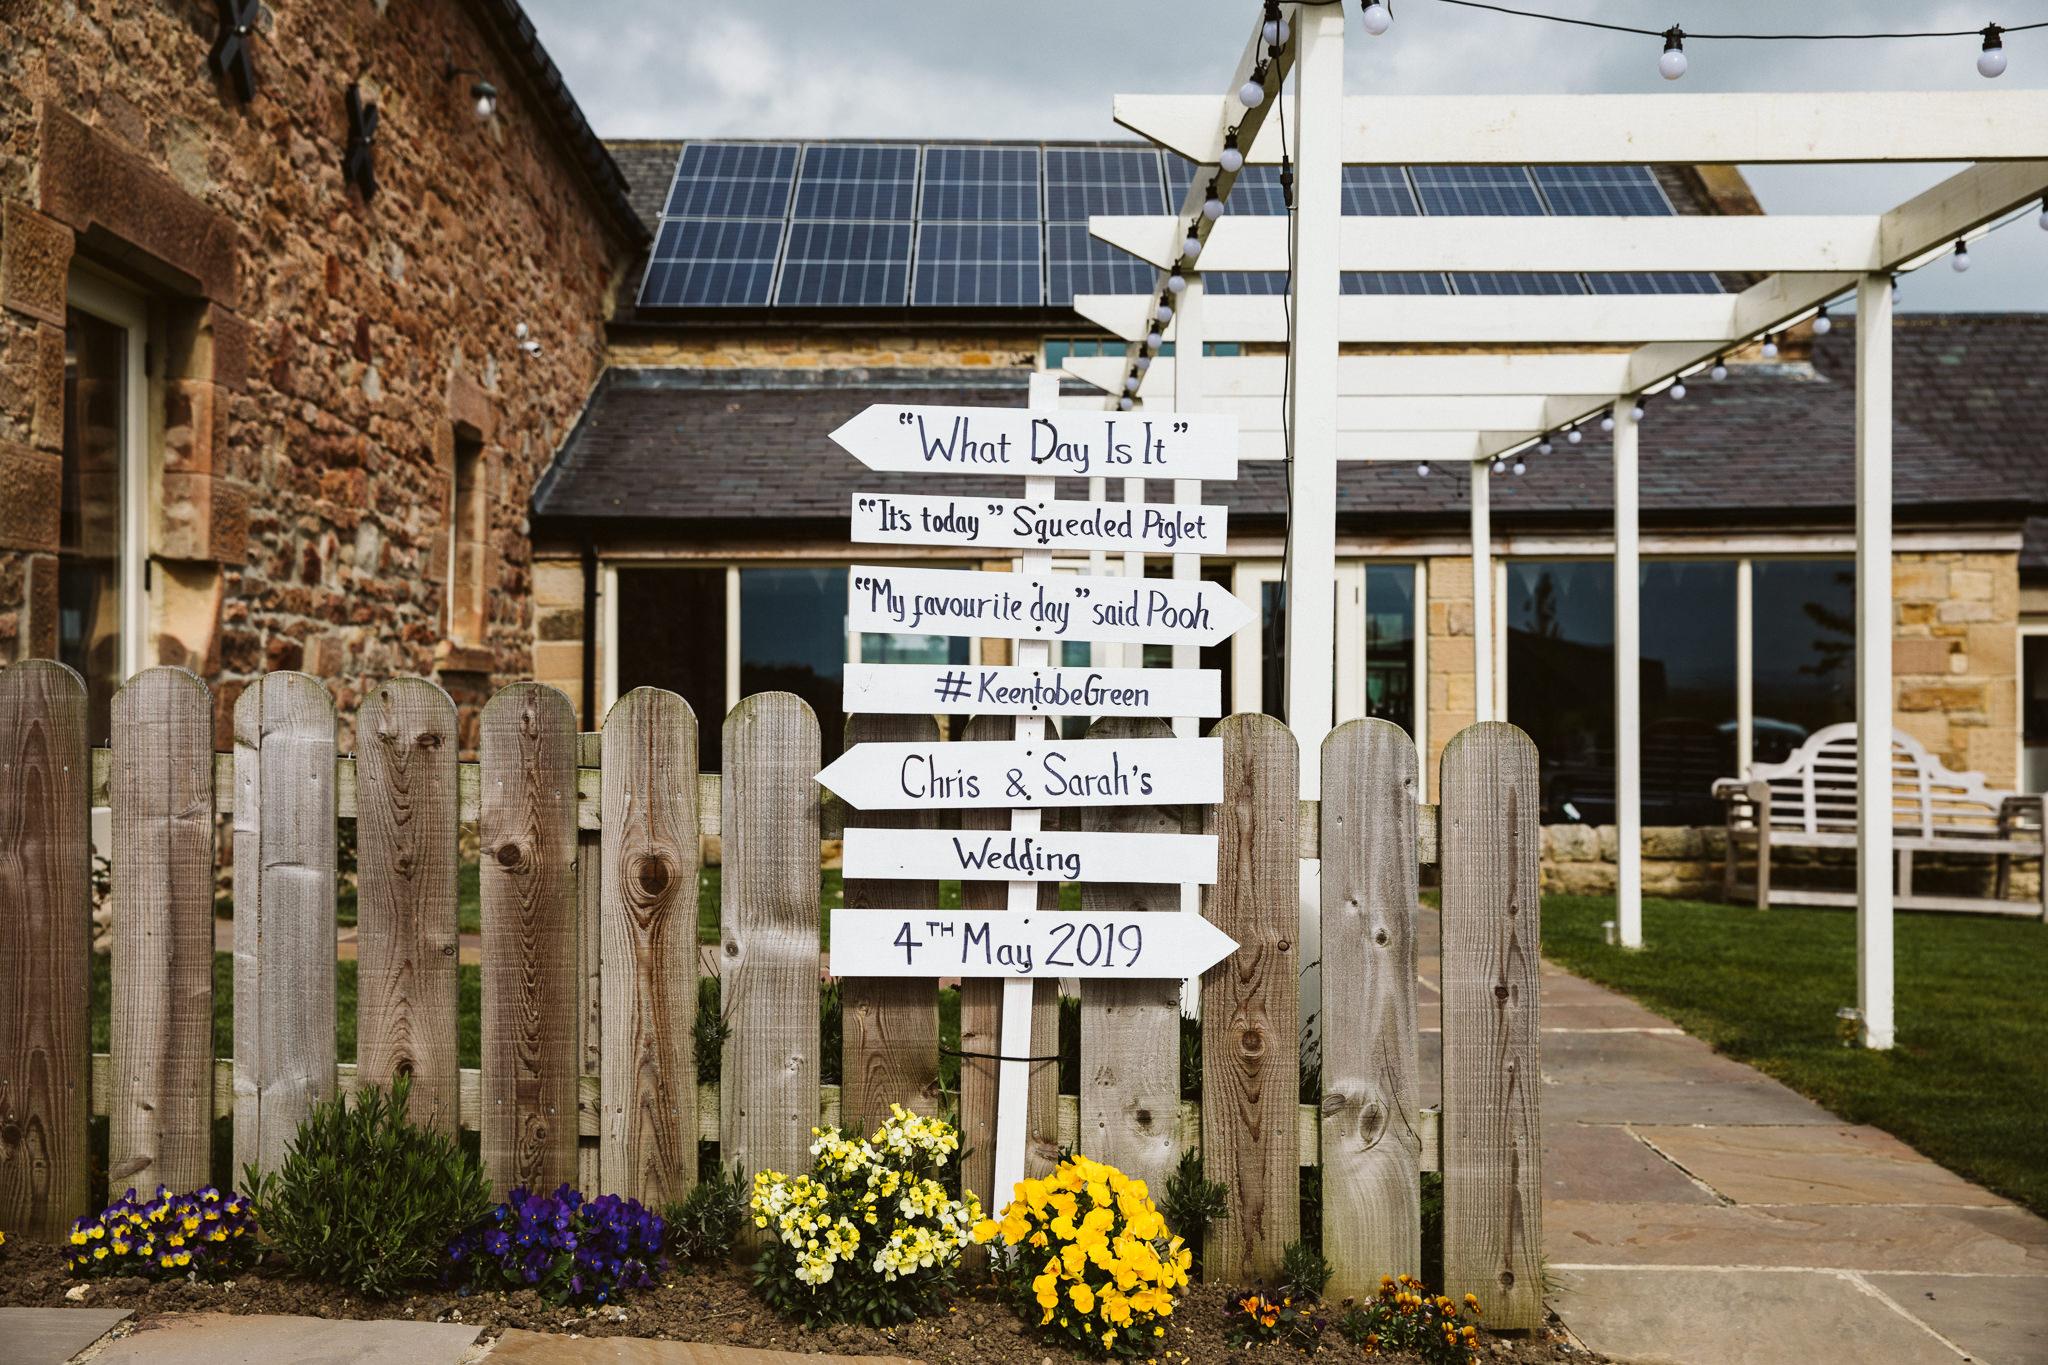 northside-farm-wedding-northumberland-margarita-hope (70).jpg